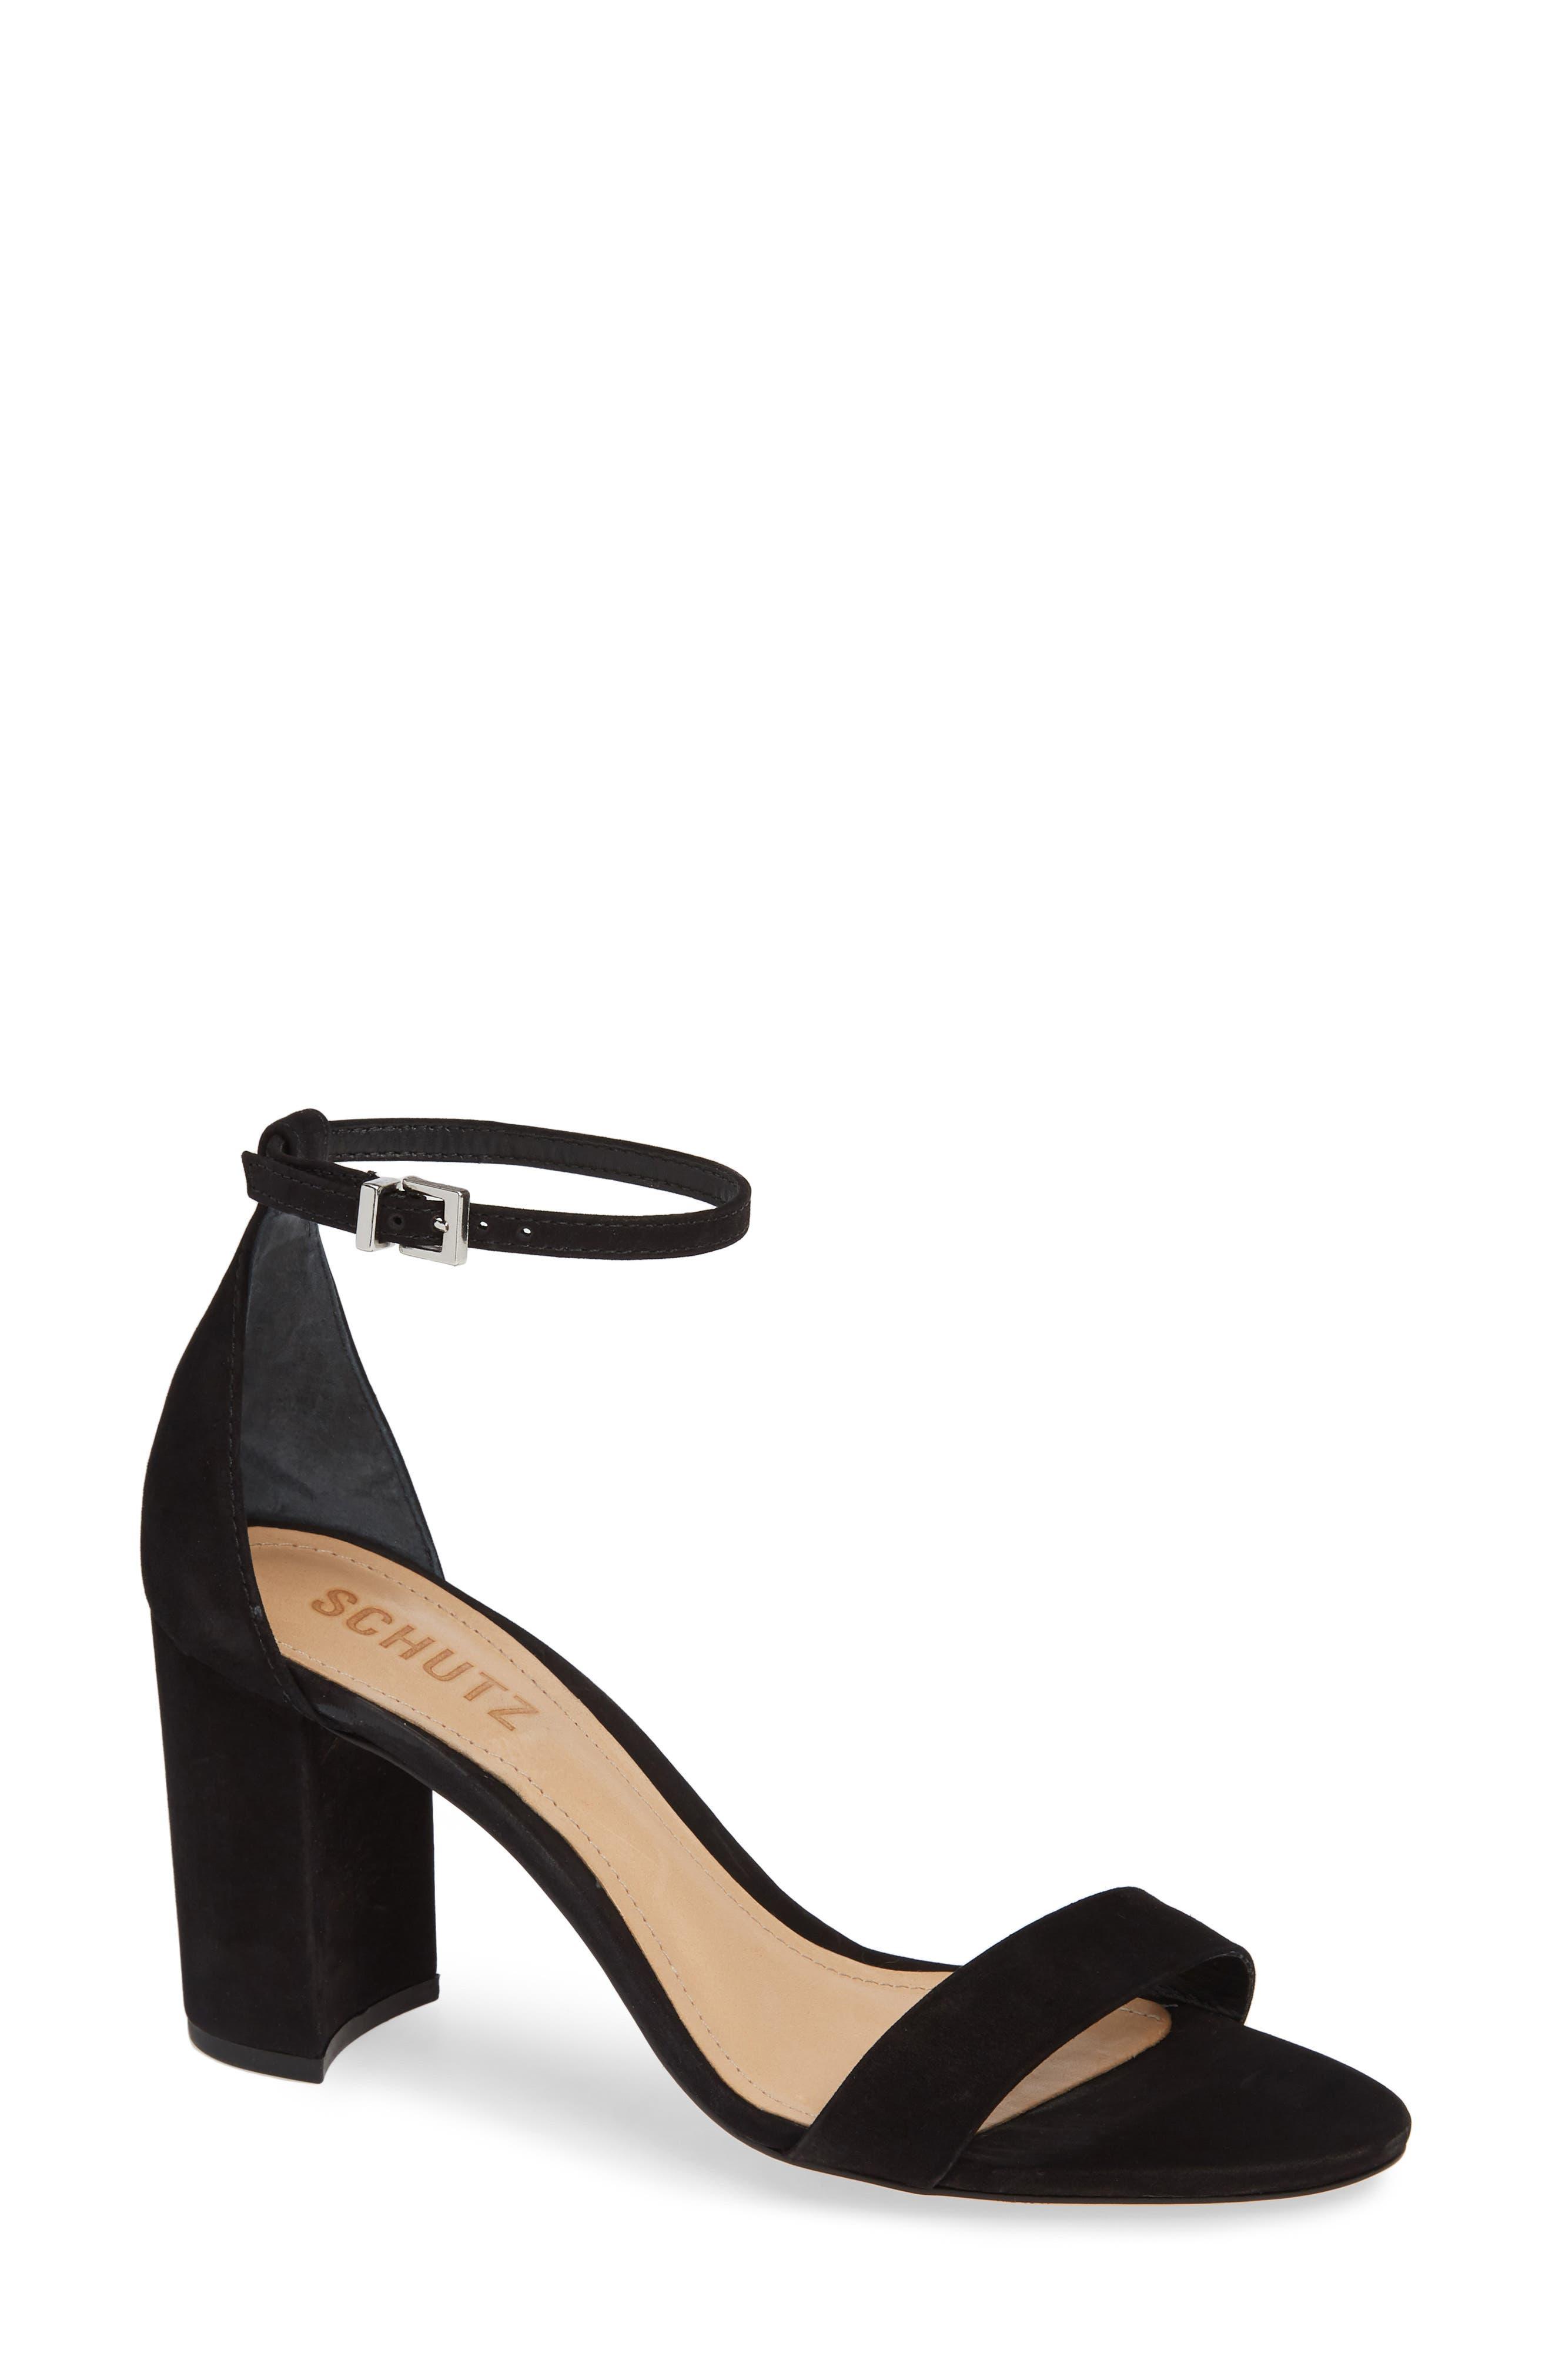 ,                             Anna Lee Ankle Strap Sandal,                             Main thumbnail 1, color,                             BLACK NUBUCK LEATHER